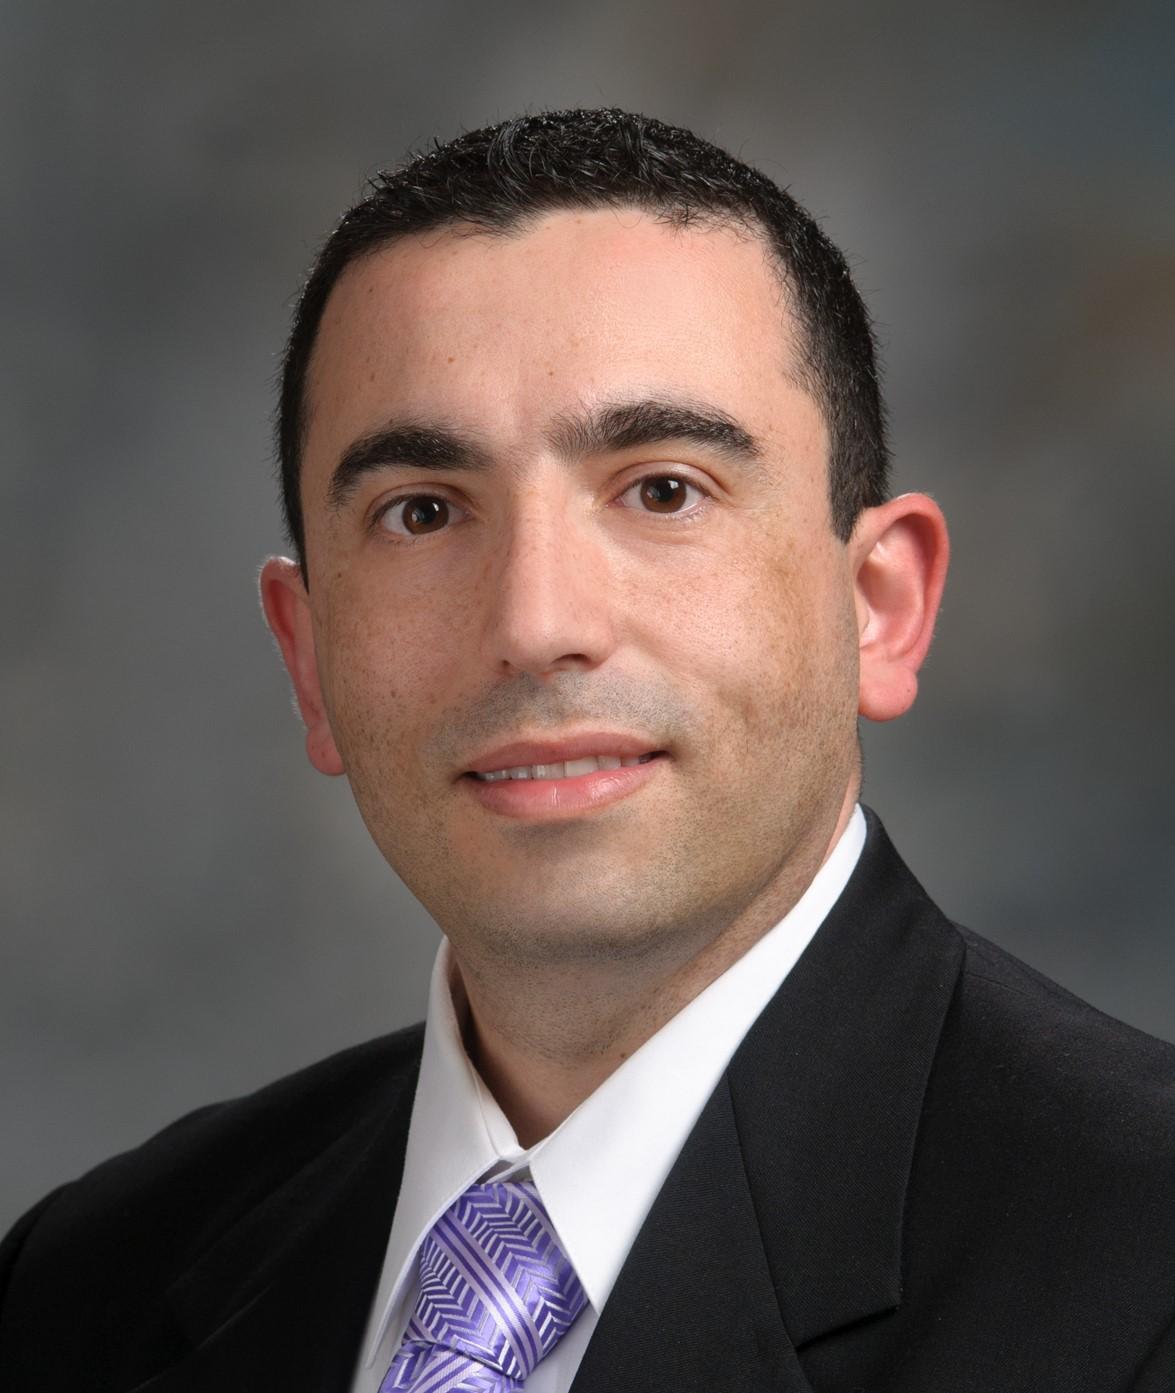 Joseph Khoury, M.D.